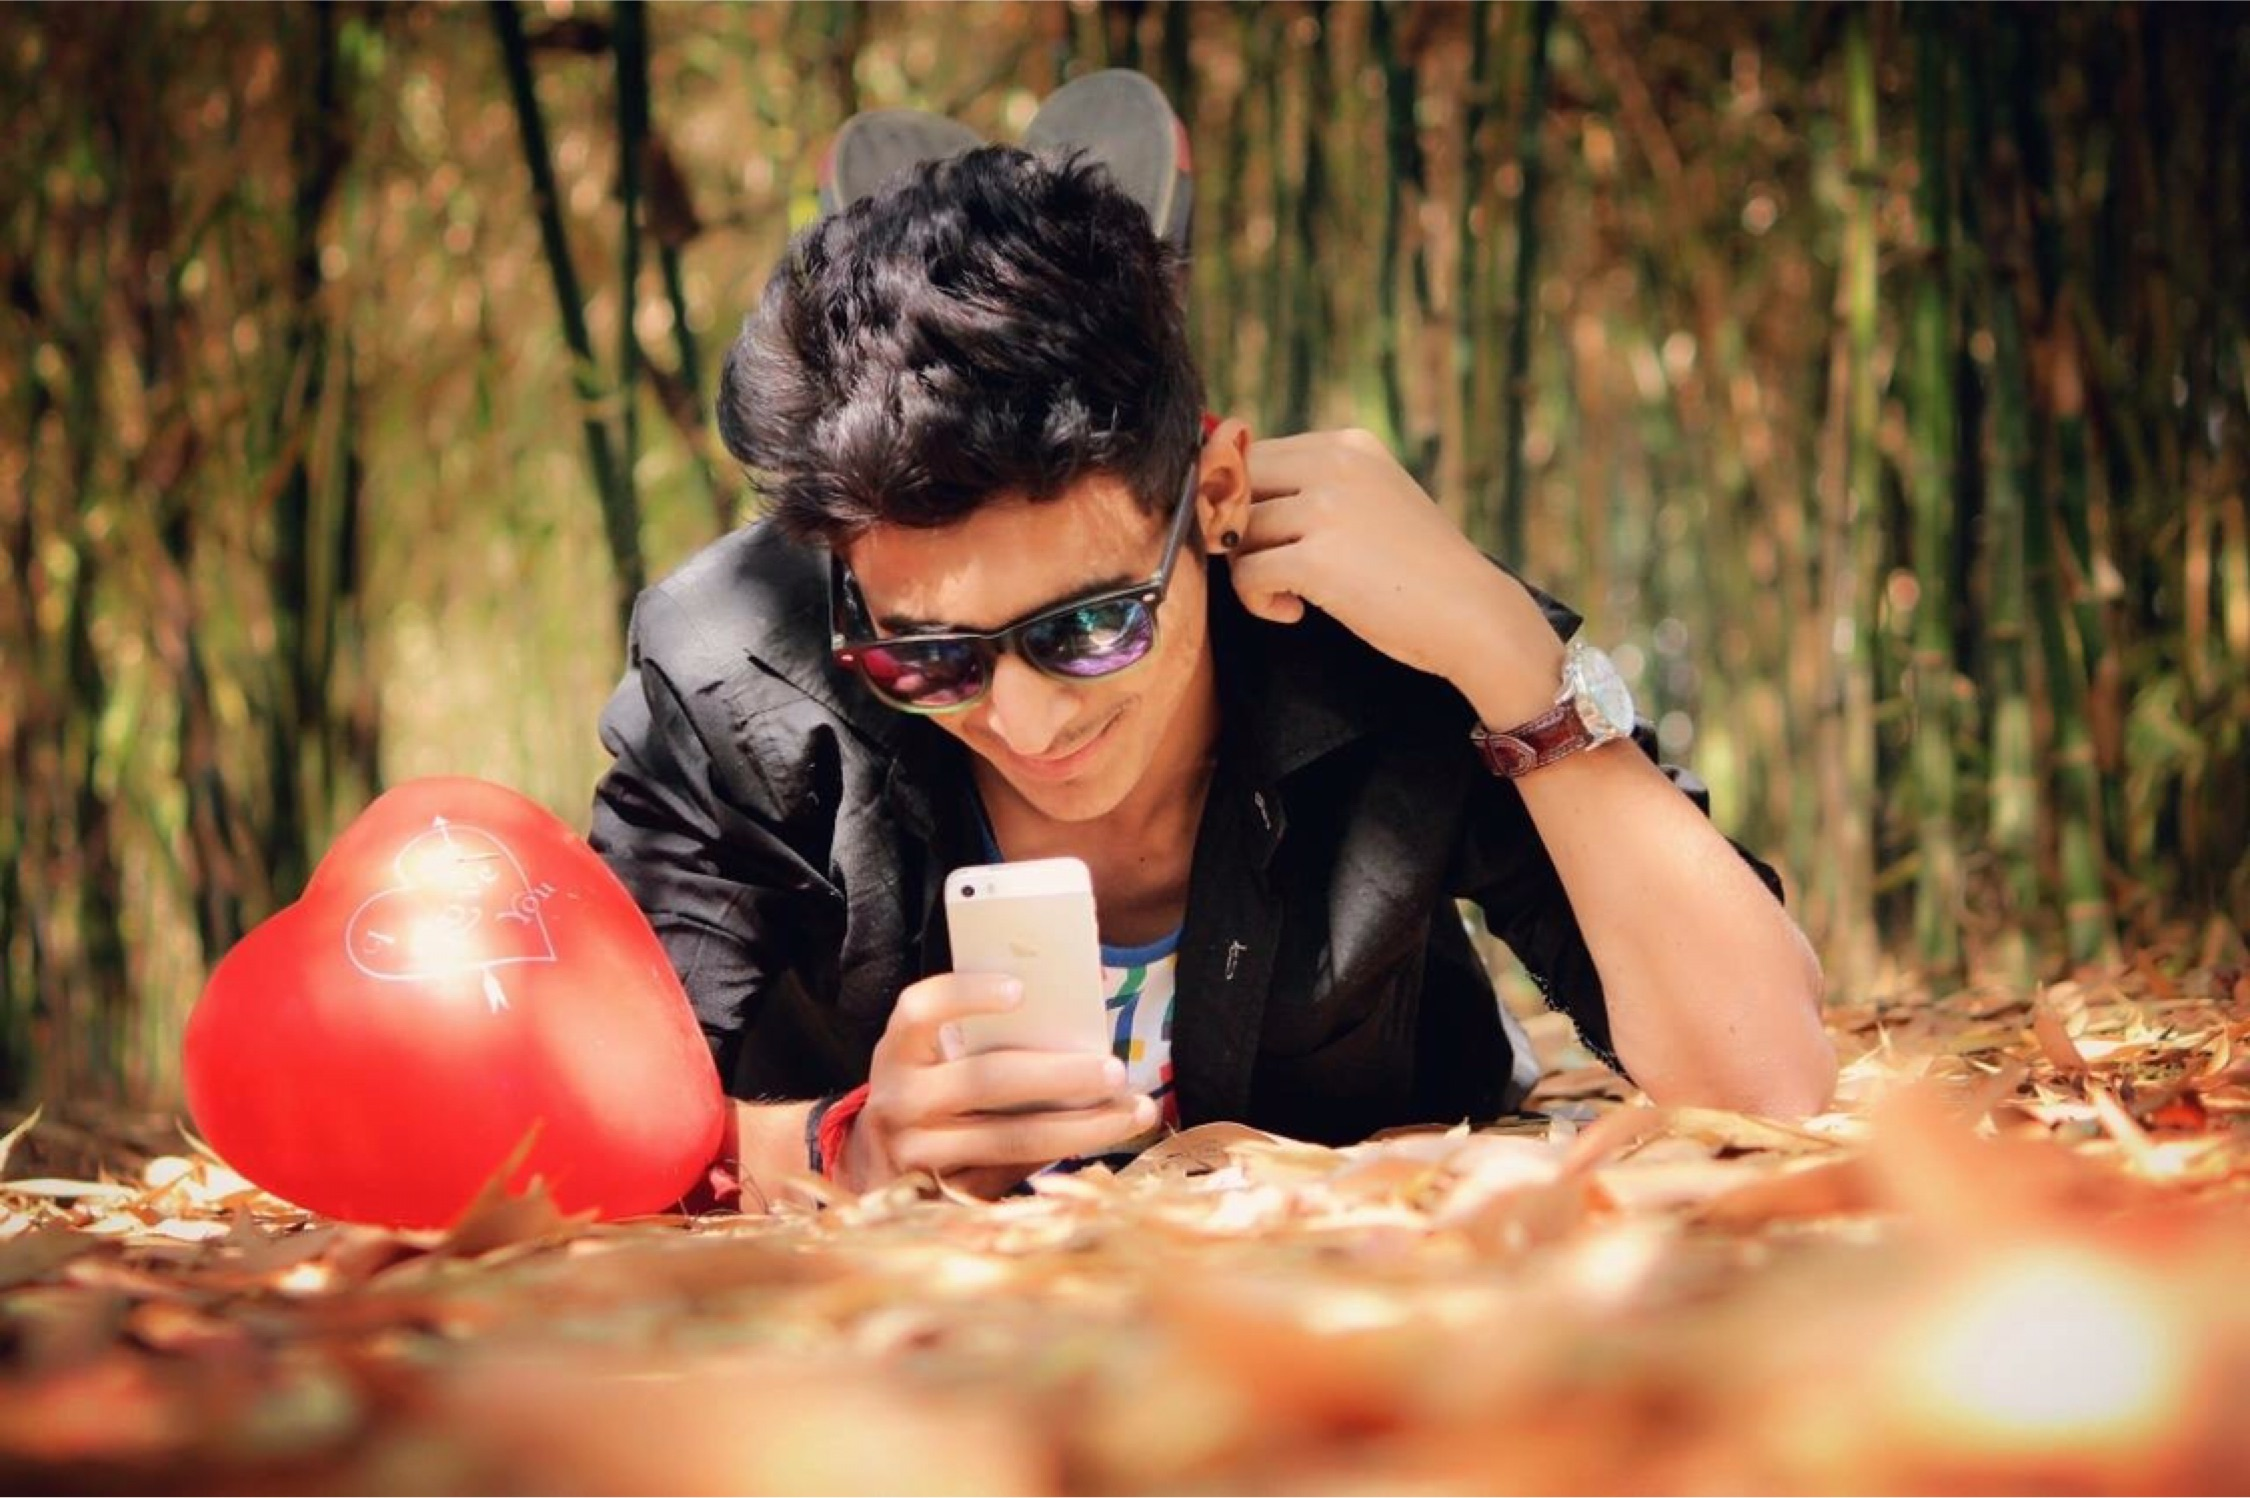 kabhi old pic bhi achee lagte he❤️🤘🏻 #smarty_sunny #picofday #shootlove☺️